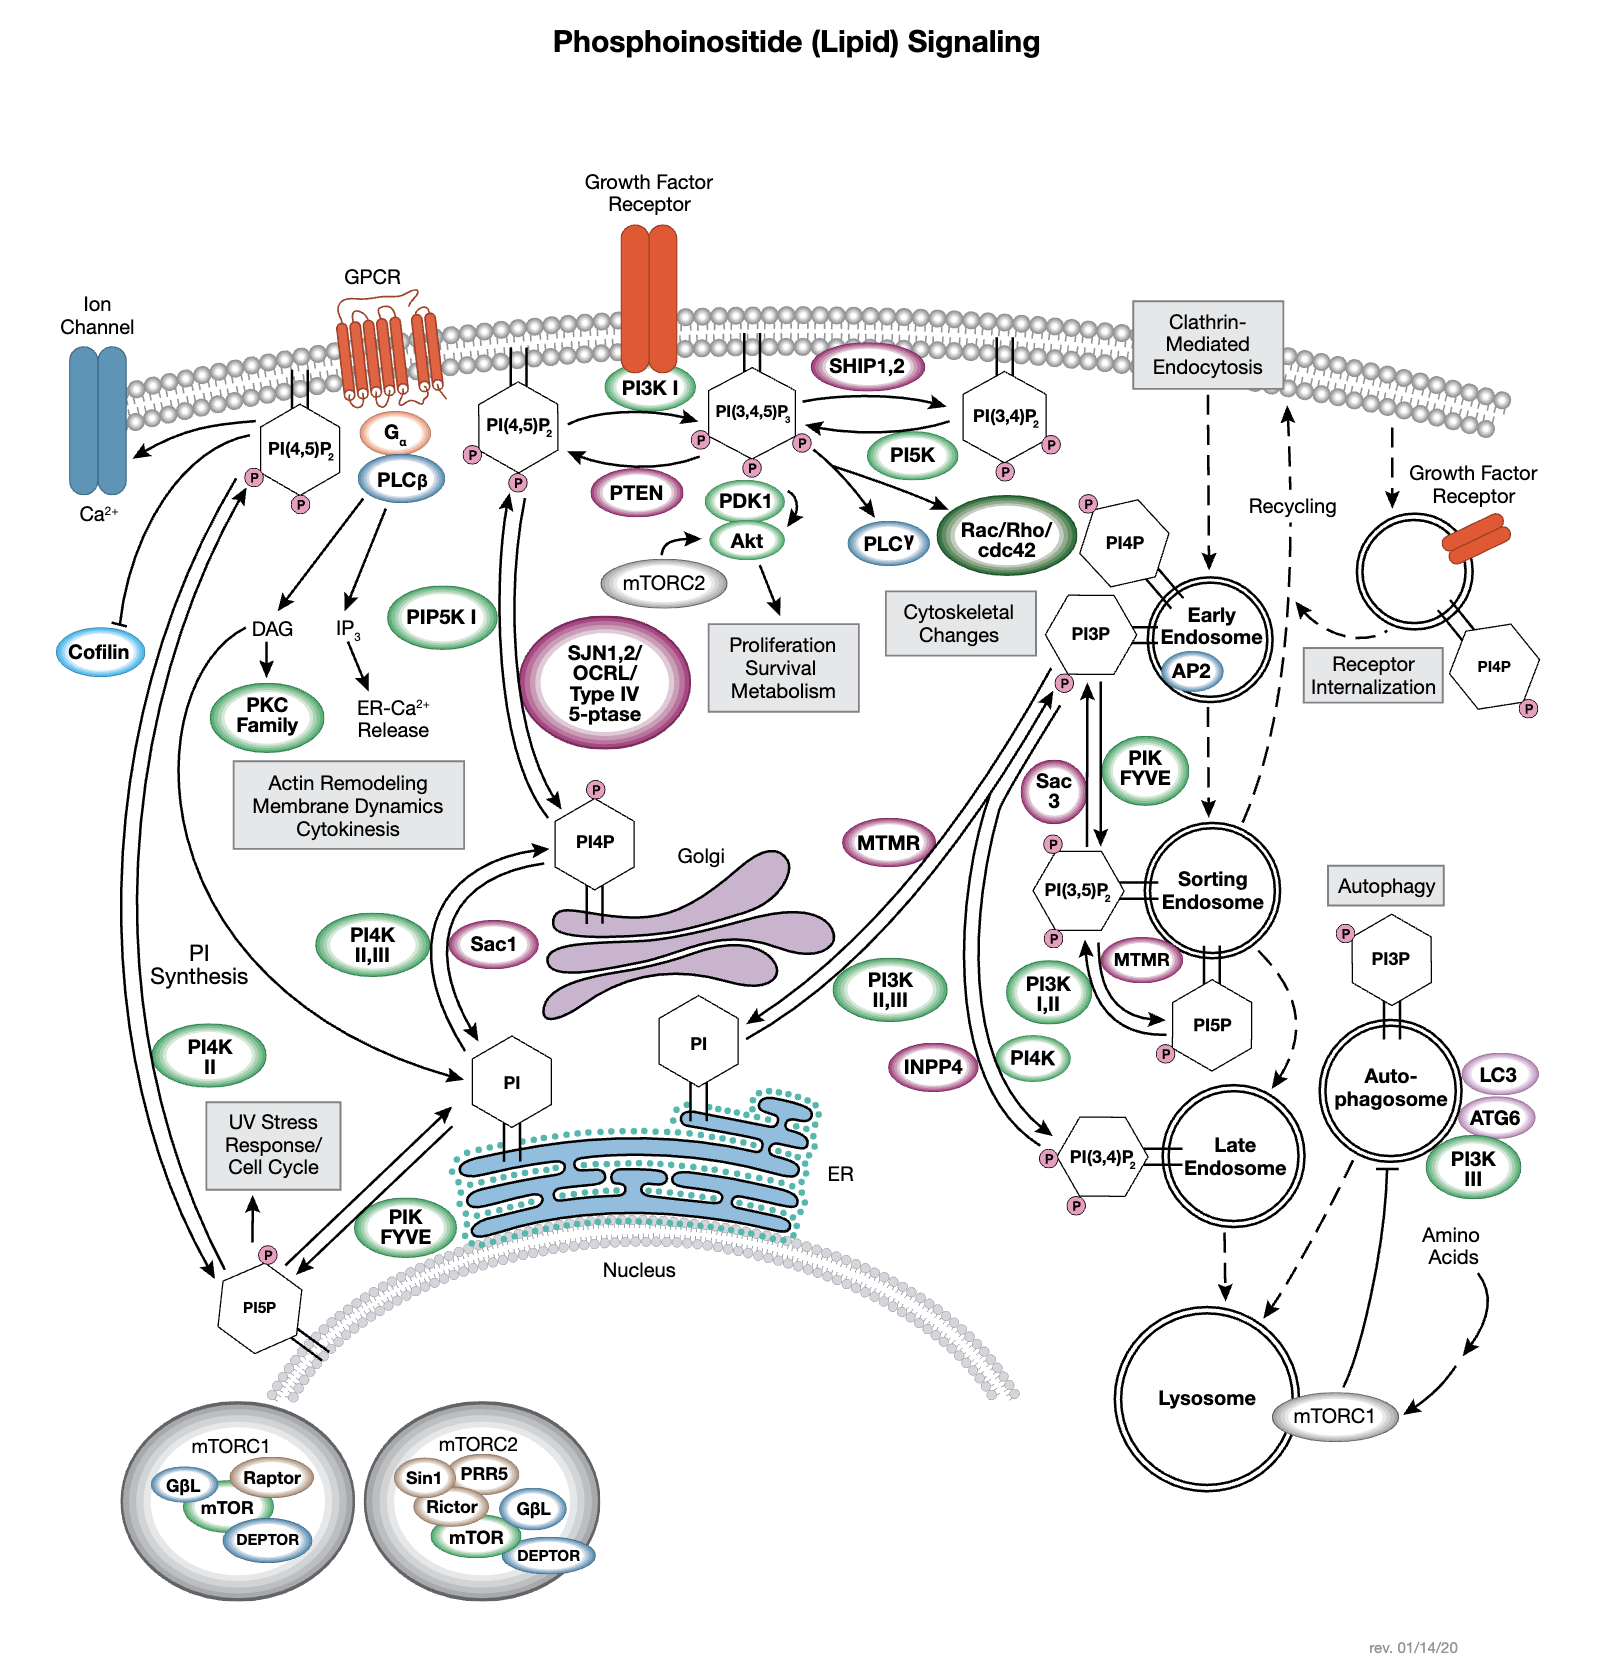 Phosphoinositide (Lipid) Signaling